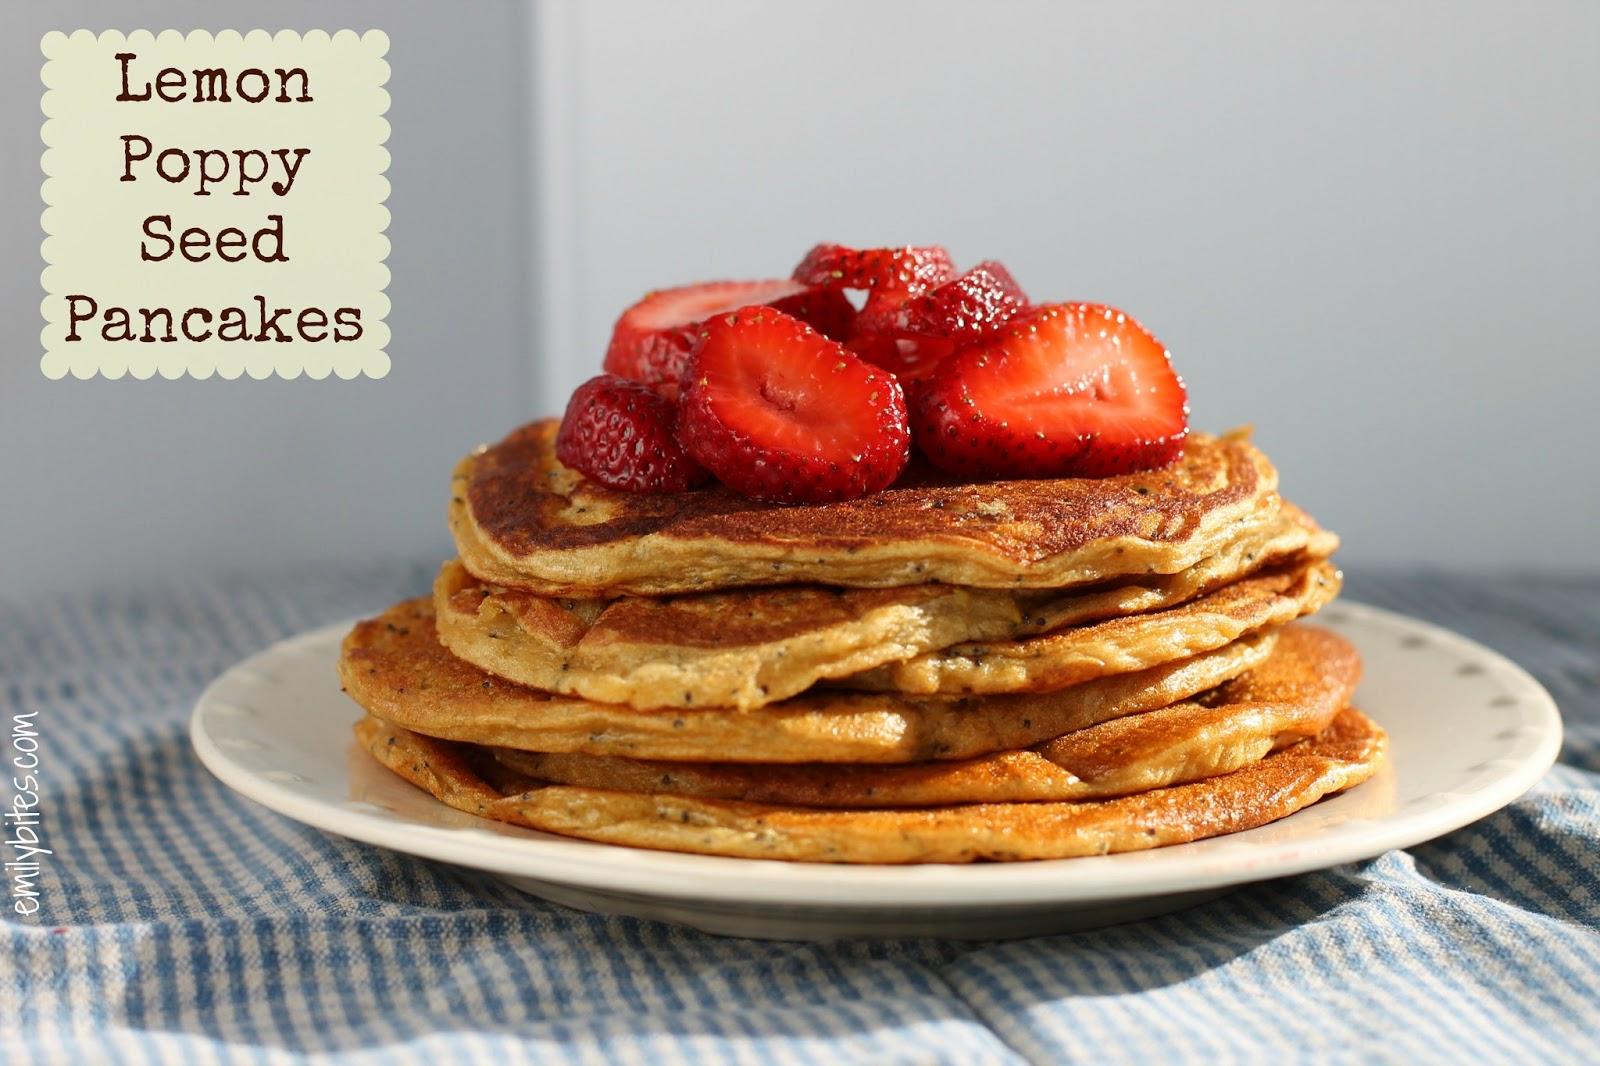 Lemon Poppy Seed Pancakes | Pinnutty.com